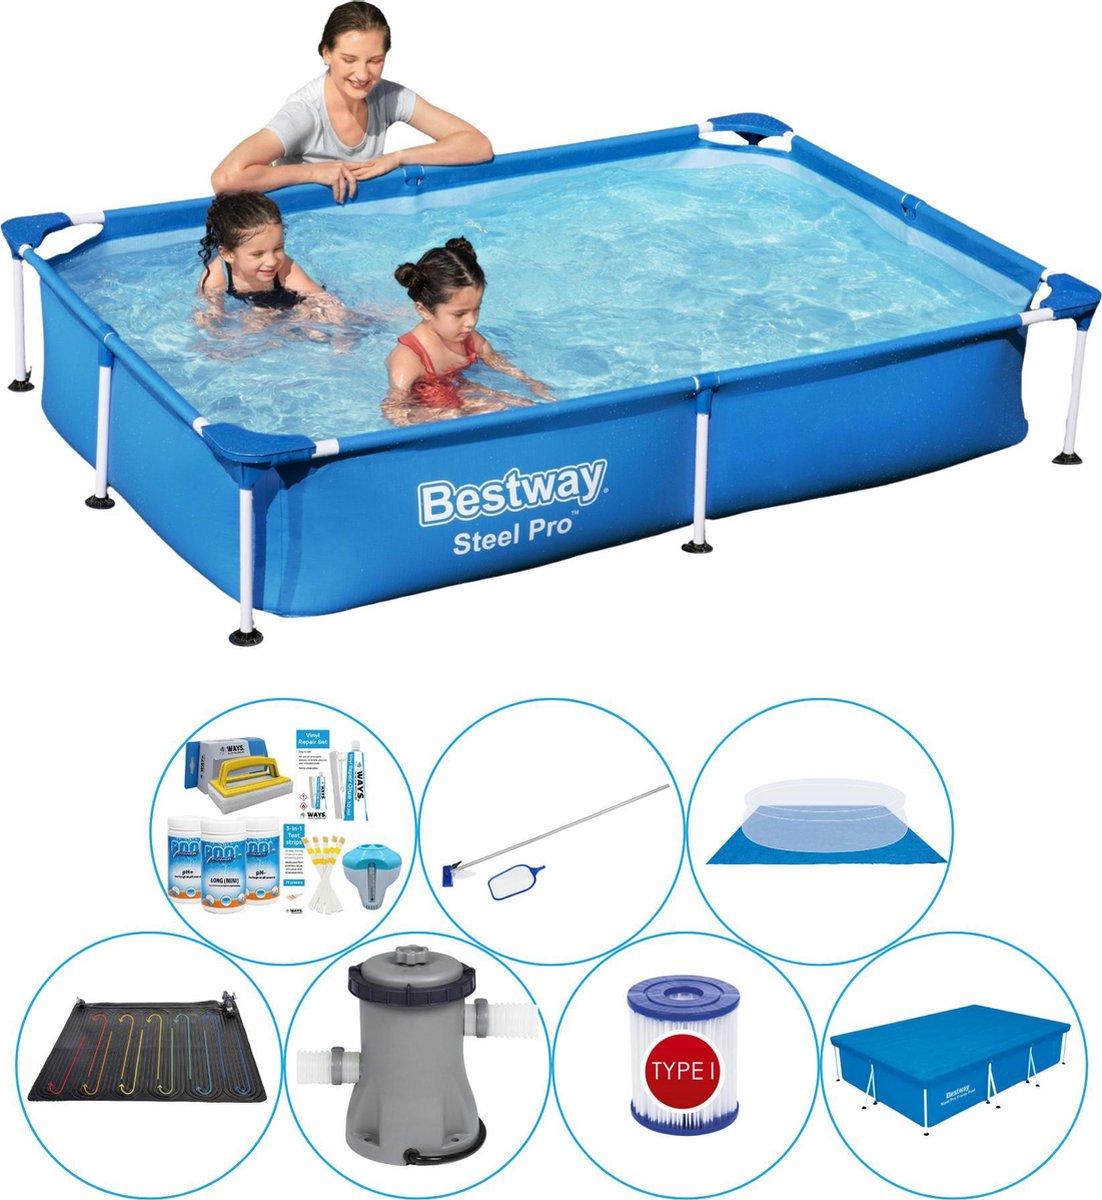 Bestway zwembad - 220 x 150 x 43 cm - afdekzeil - grondzeil - pomp - onderhoudsset - chloorpakket